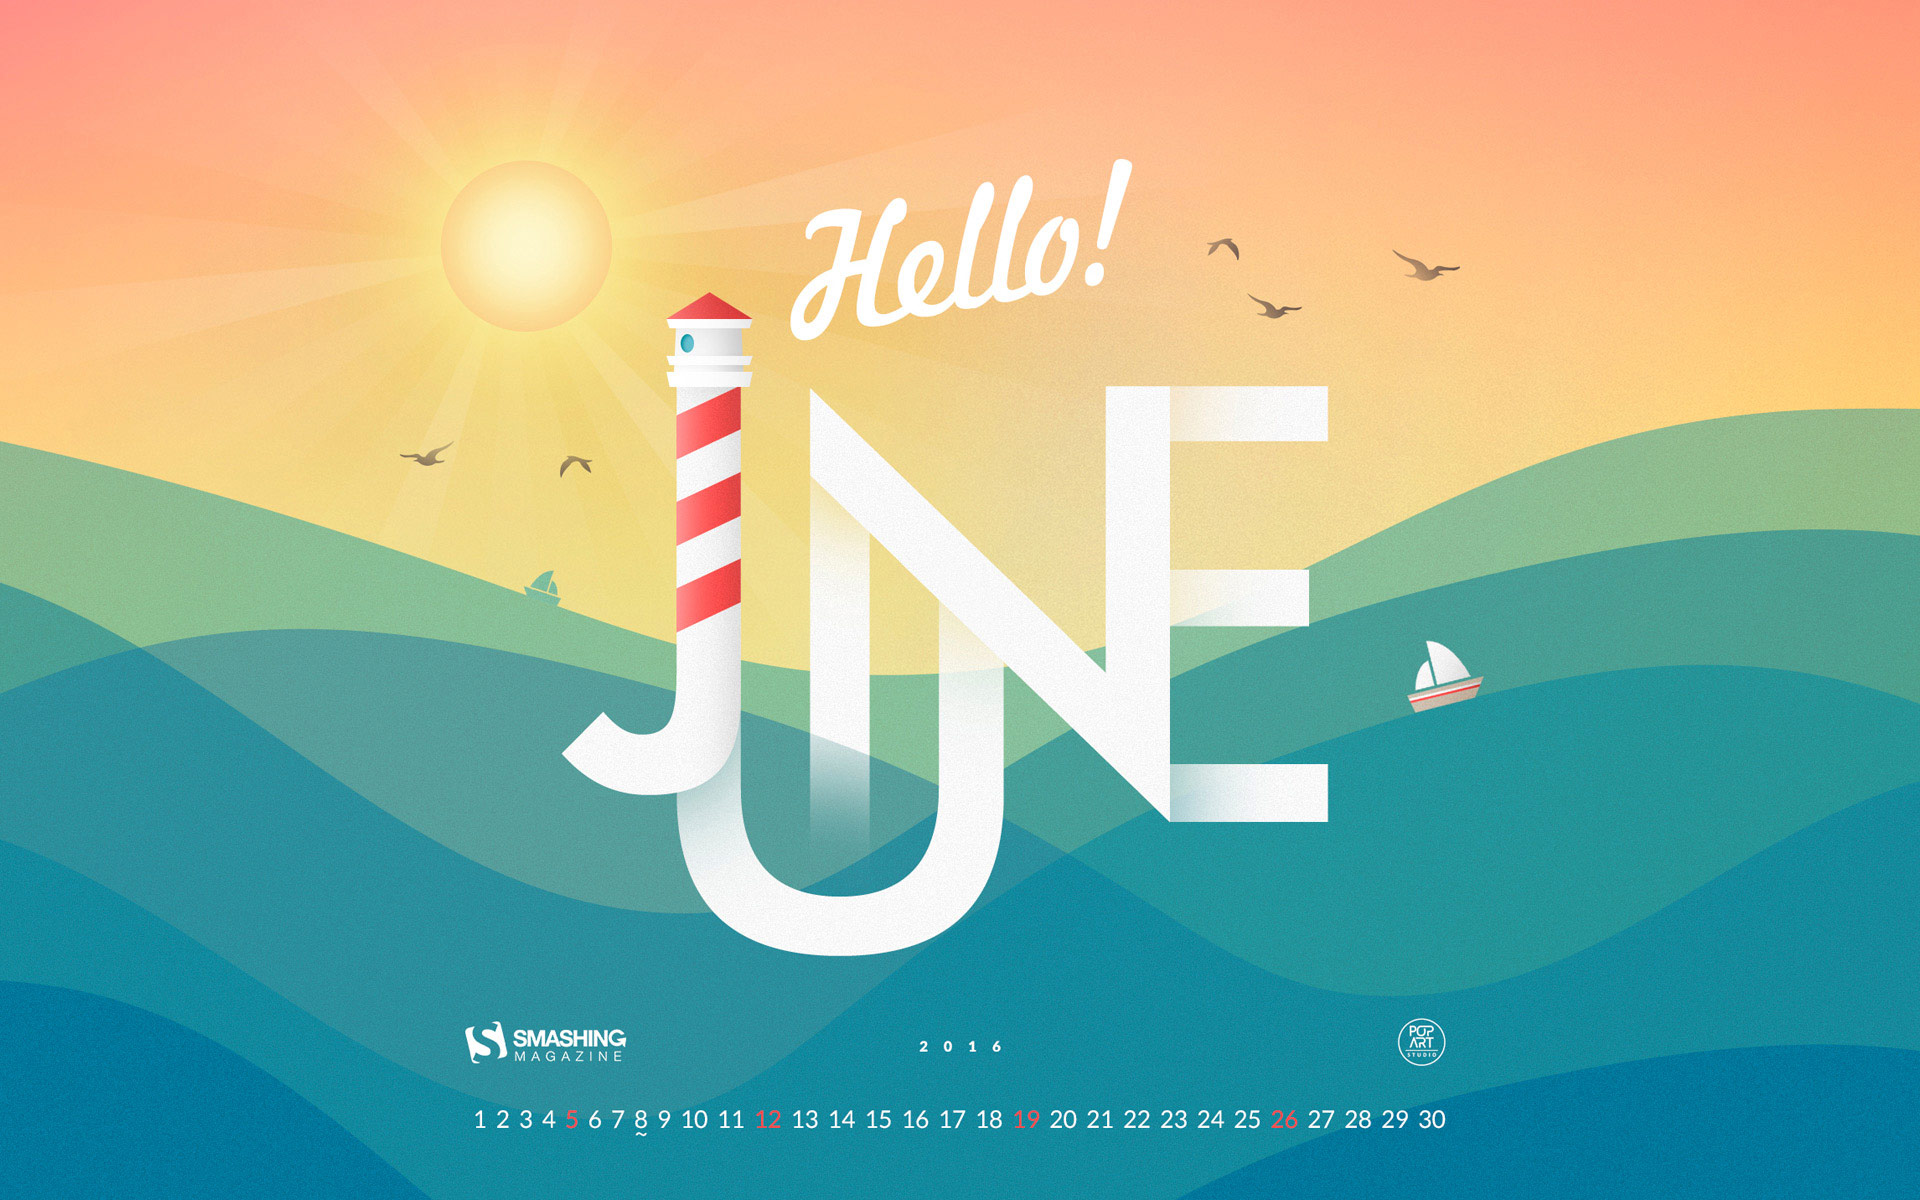 Desktop Wallpaper Calendars June 2016 Smashing Magazine 1920x1200